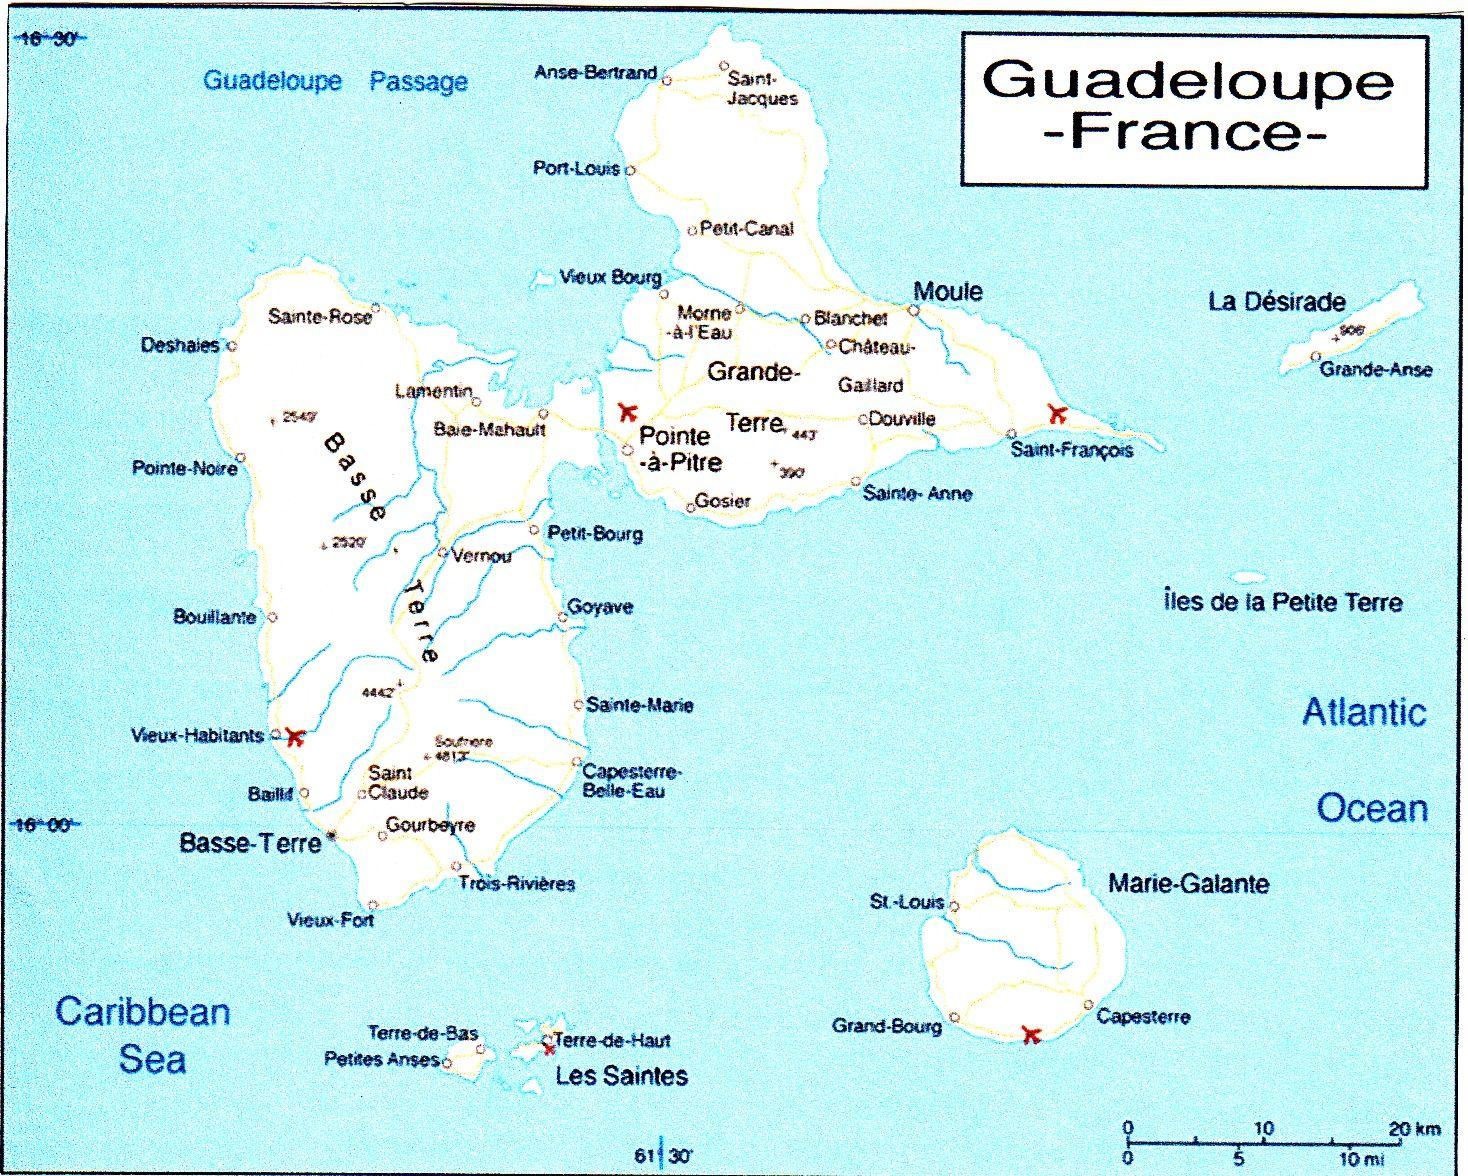 Les Saintes Island Guadeloupe TO6A Map